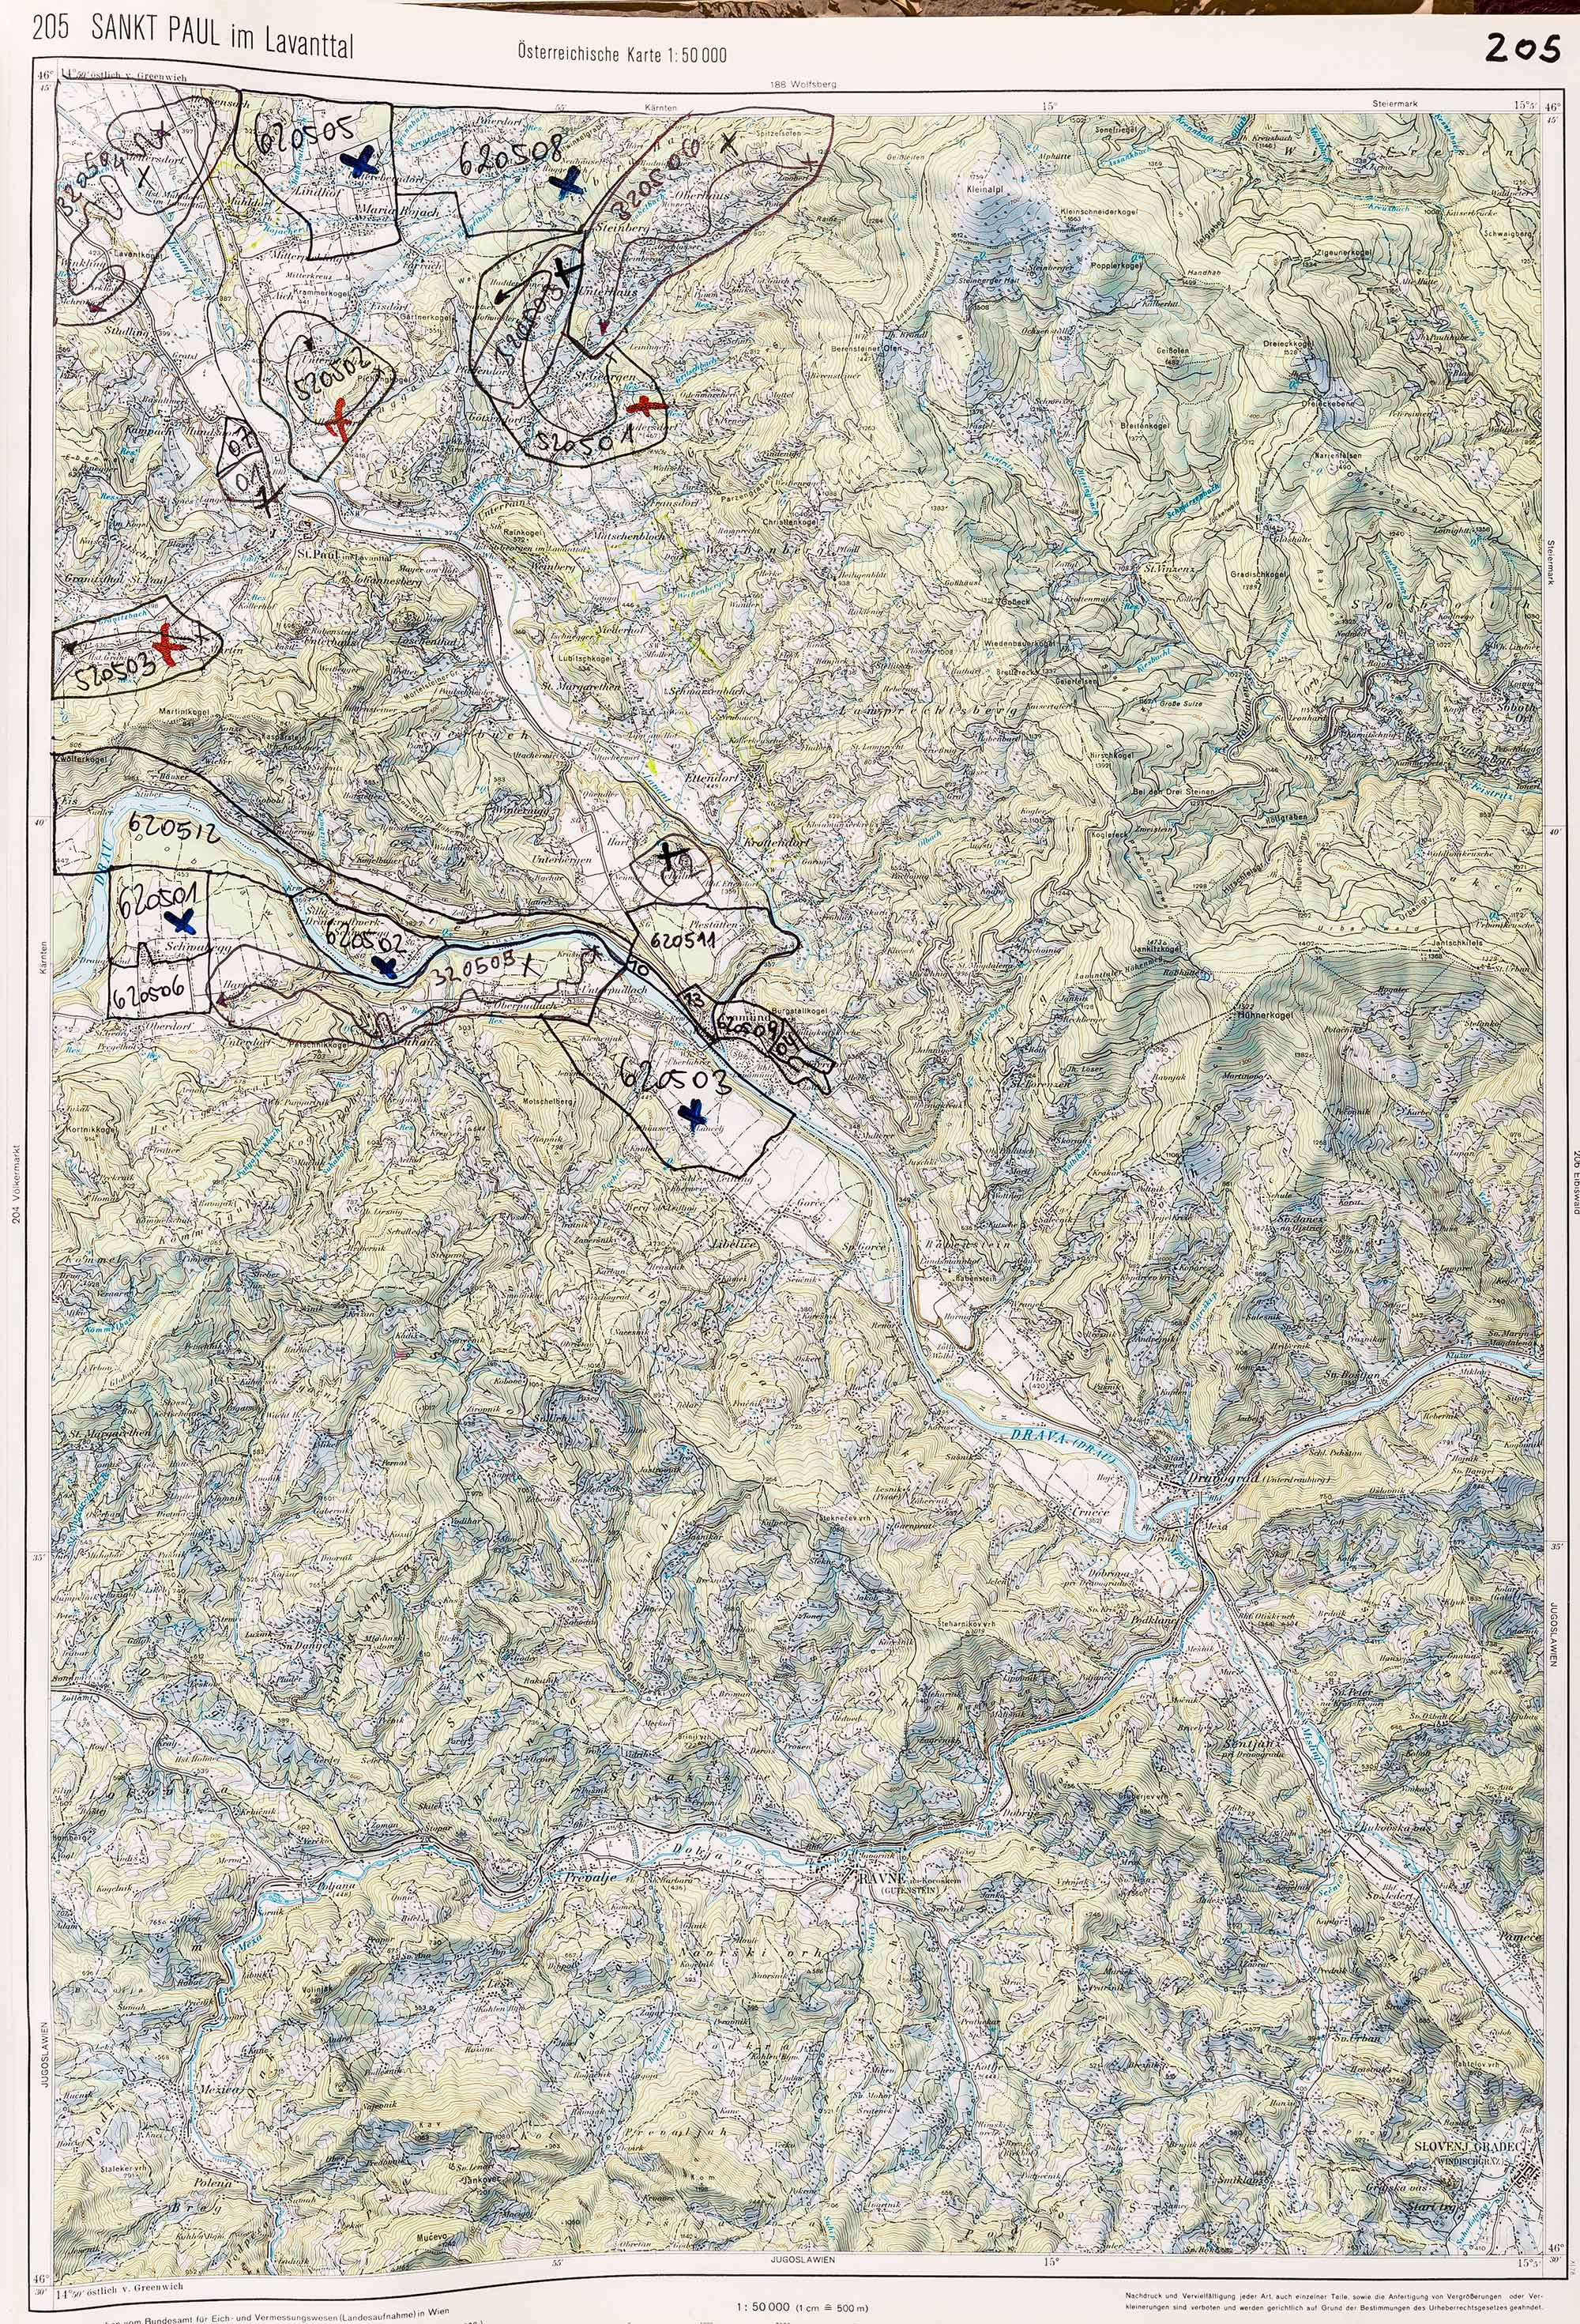 1983-1986 Karte 205